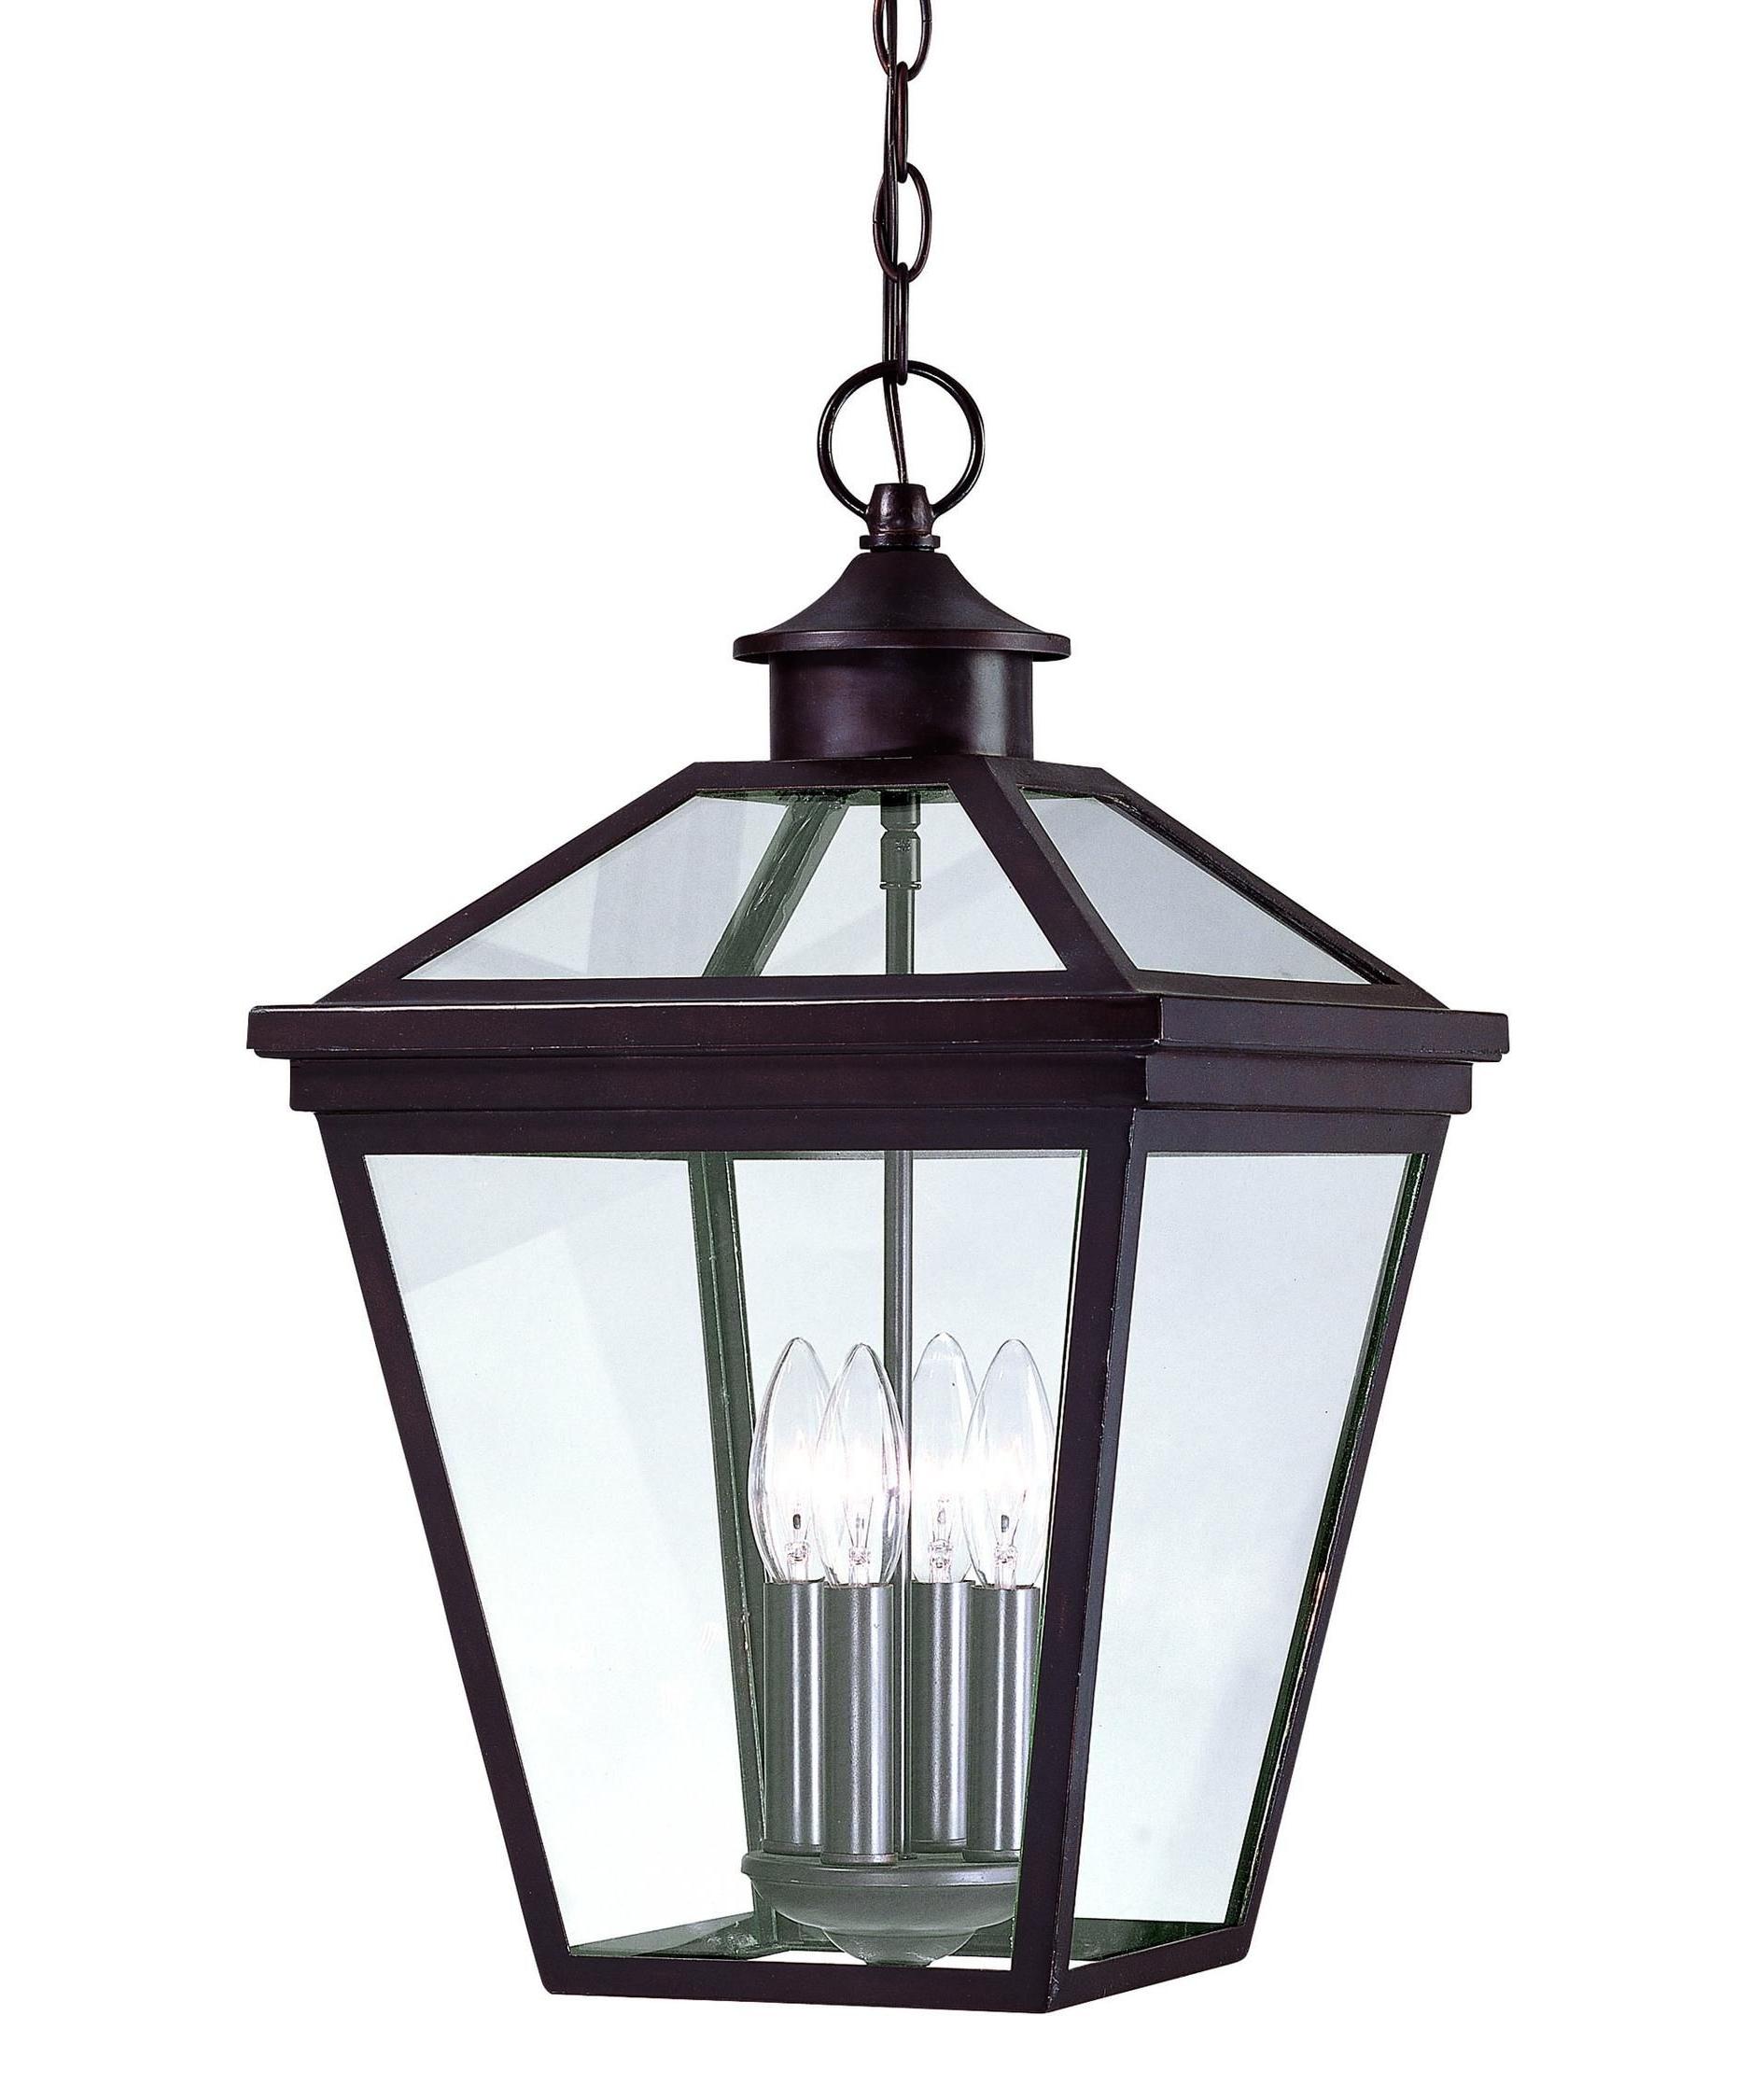 Outdoor Hanging Lights Regarding Trendy Savoy House Ellijay 4 Light Outdoor Hanging Lantern (View 14 of 20)